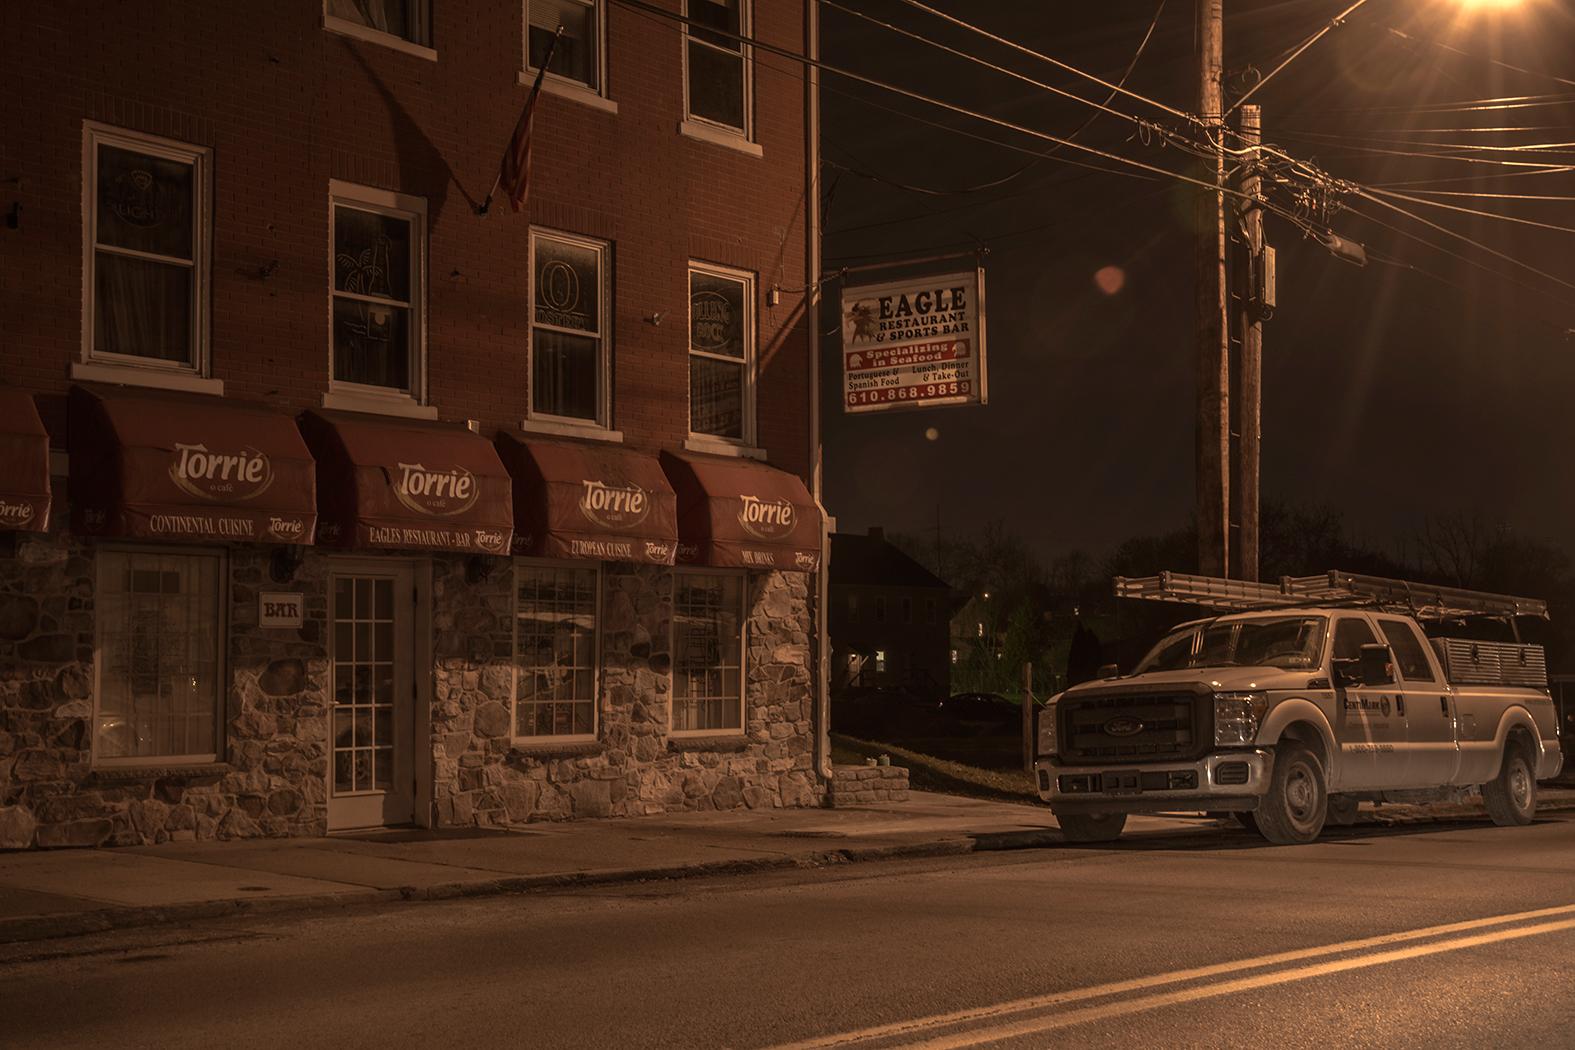 night,bar,sports,pennsylvania,photo noir,dark,night,